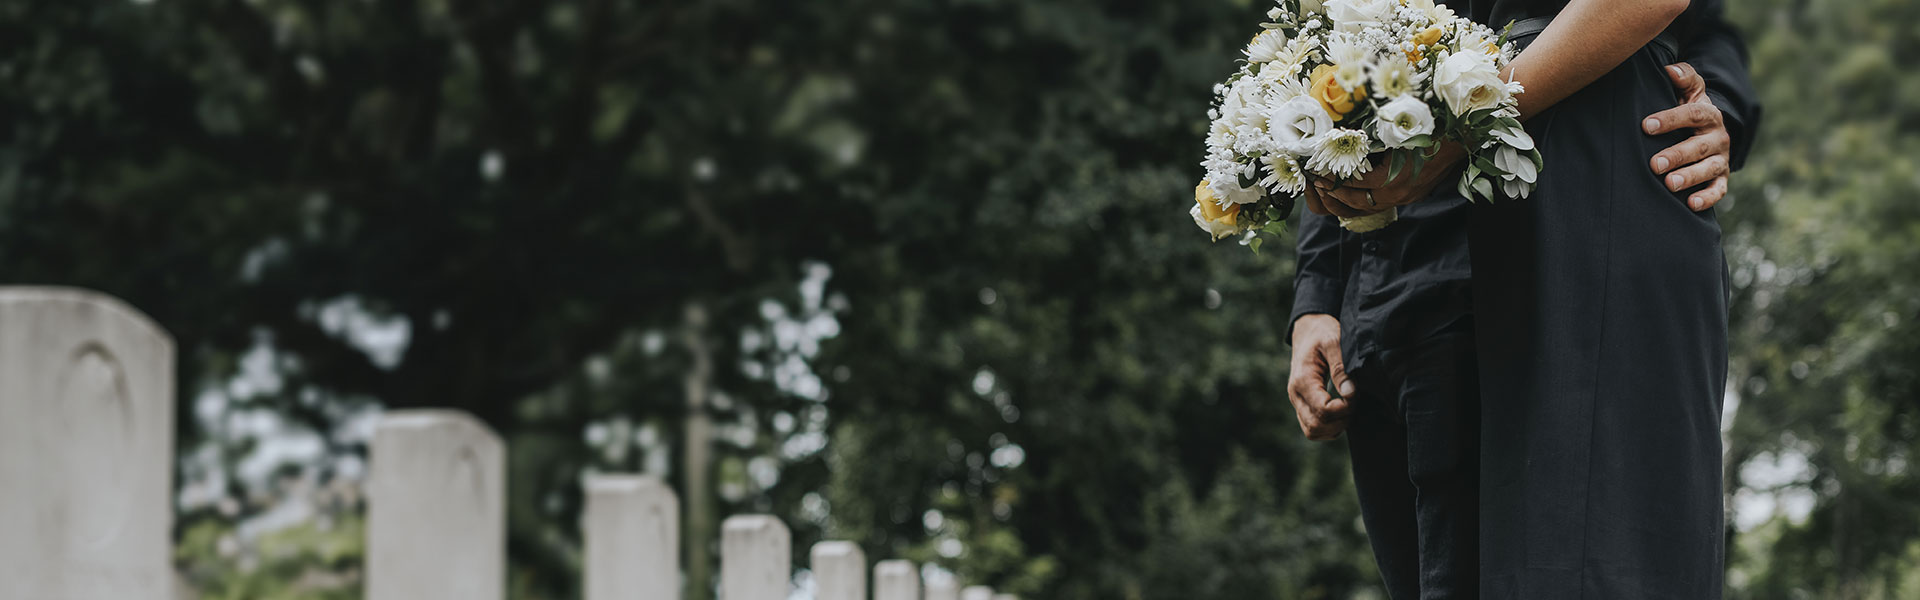 Agenzia funebre solopaca